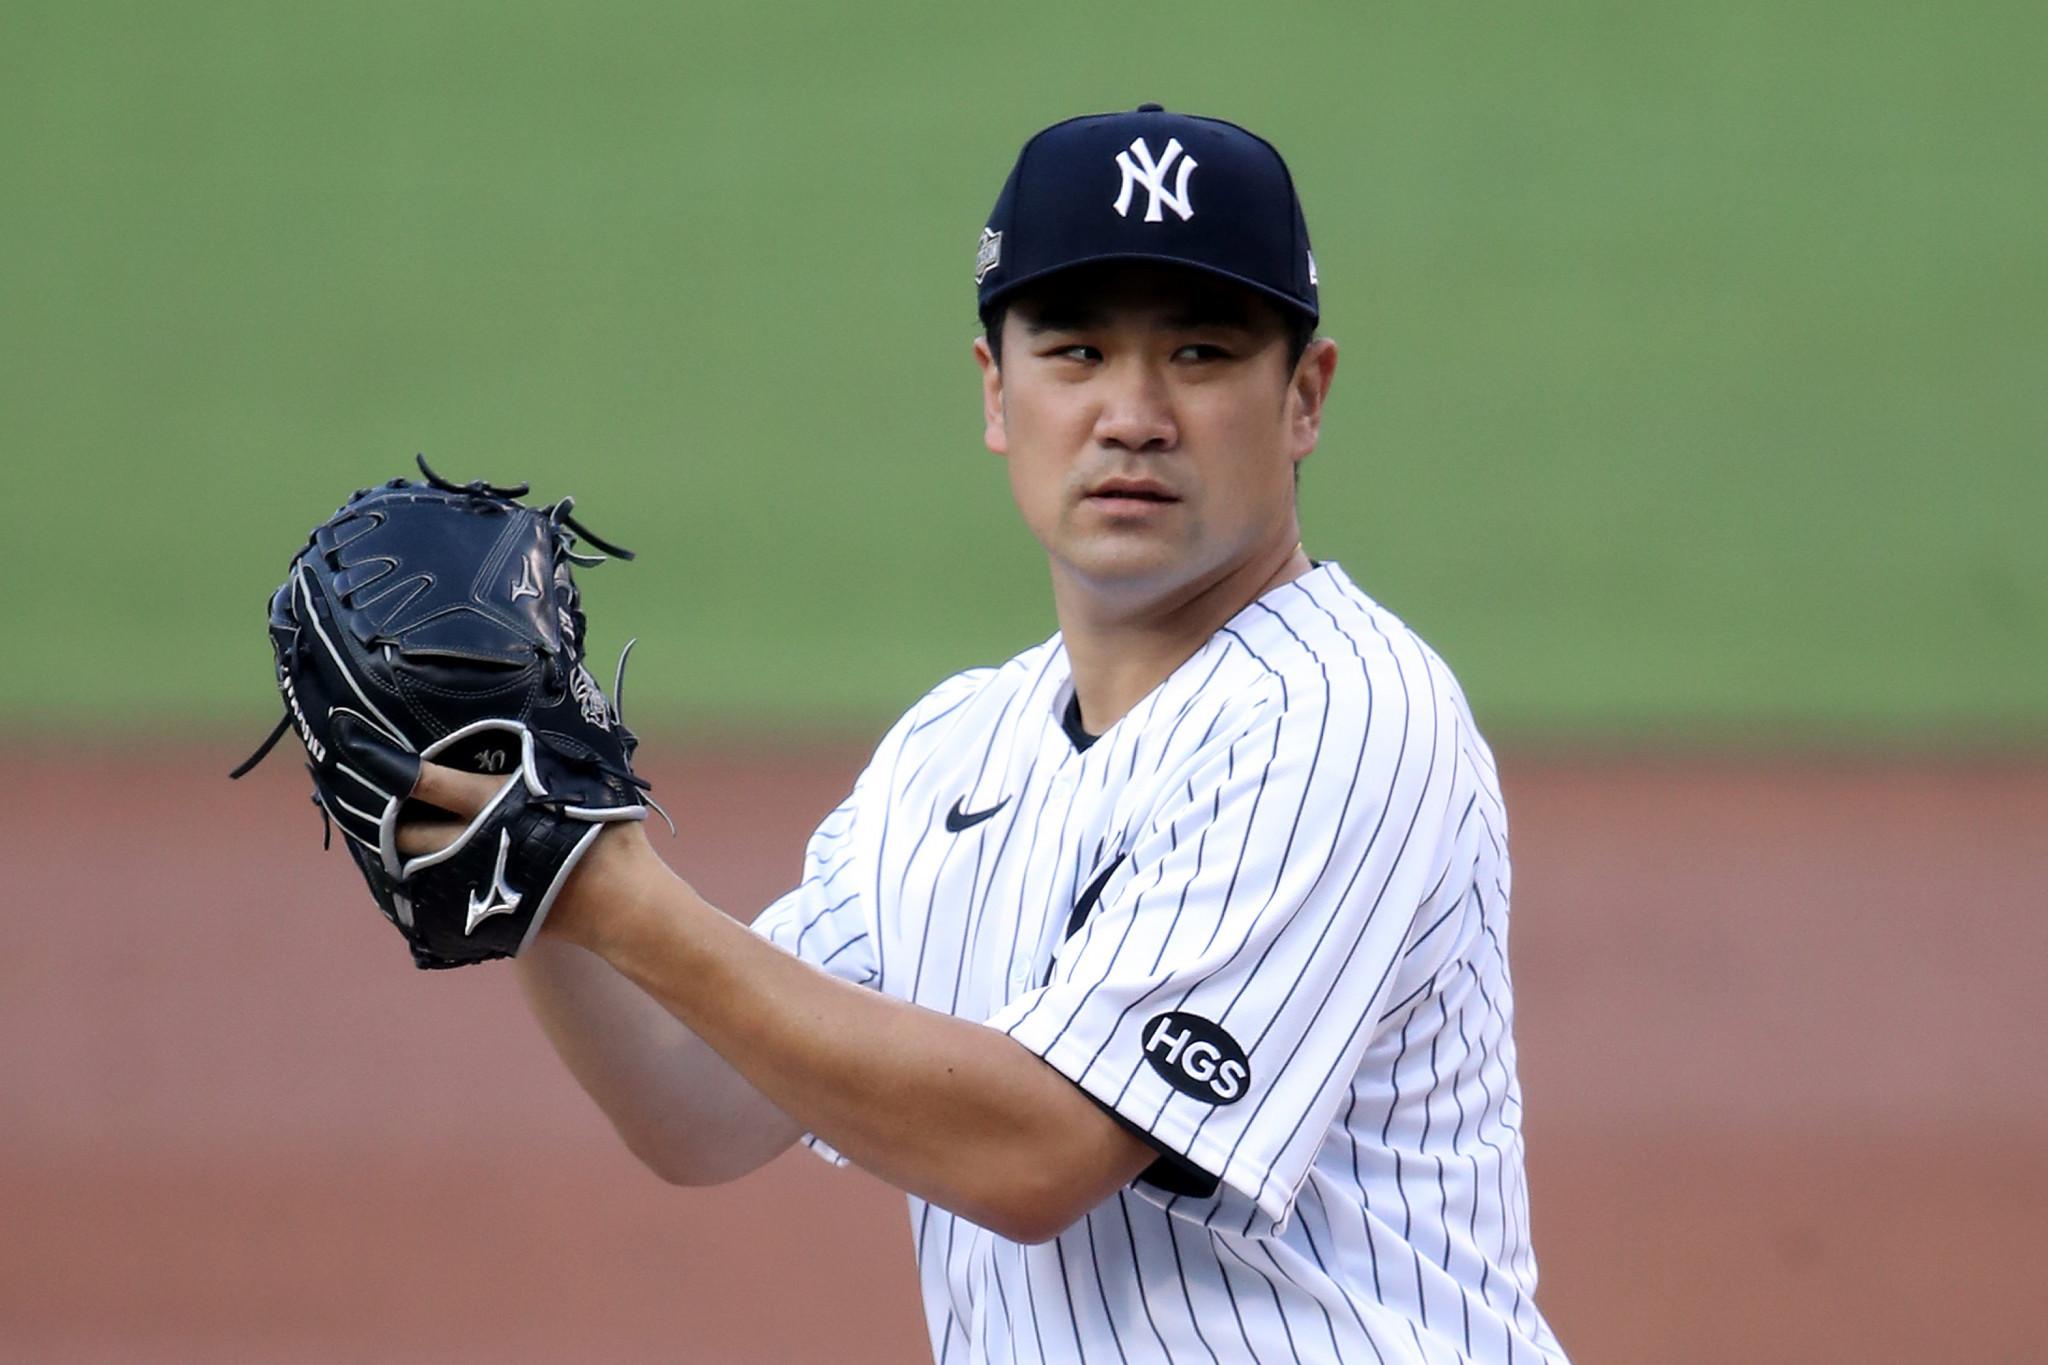 Ex-Yankee Tanaka named in Japan's Olympic baseball squad